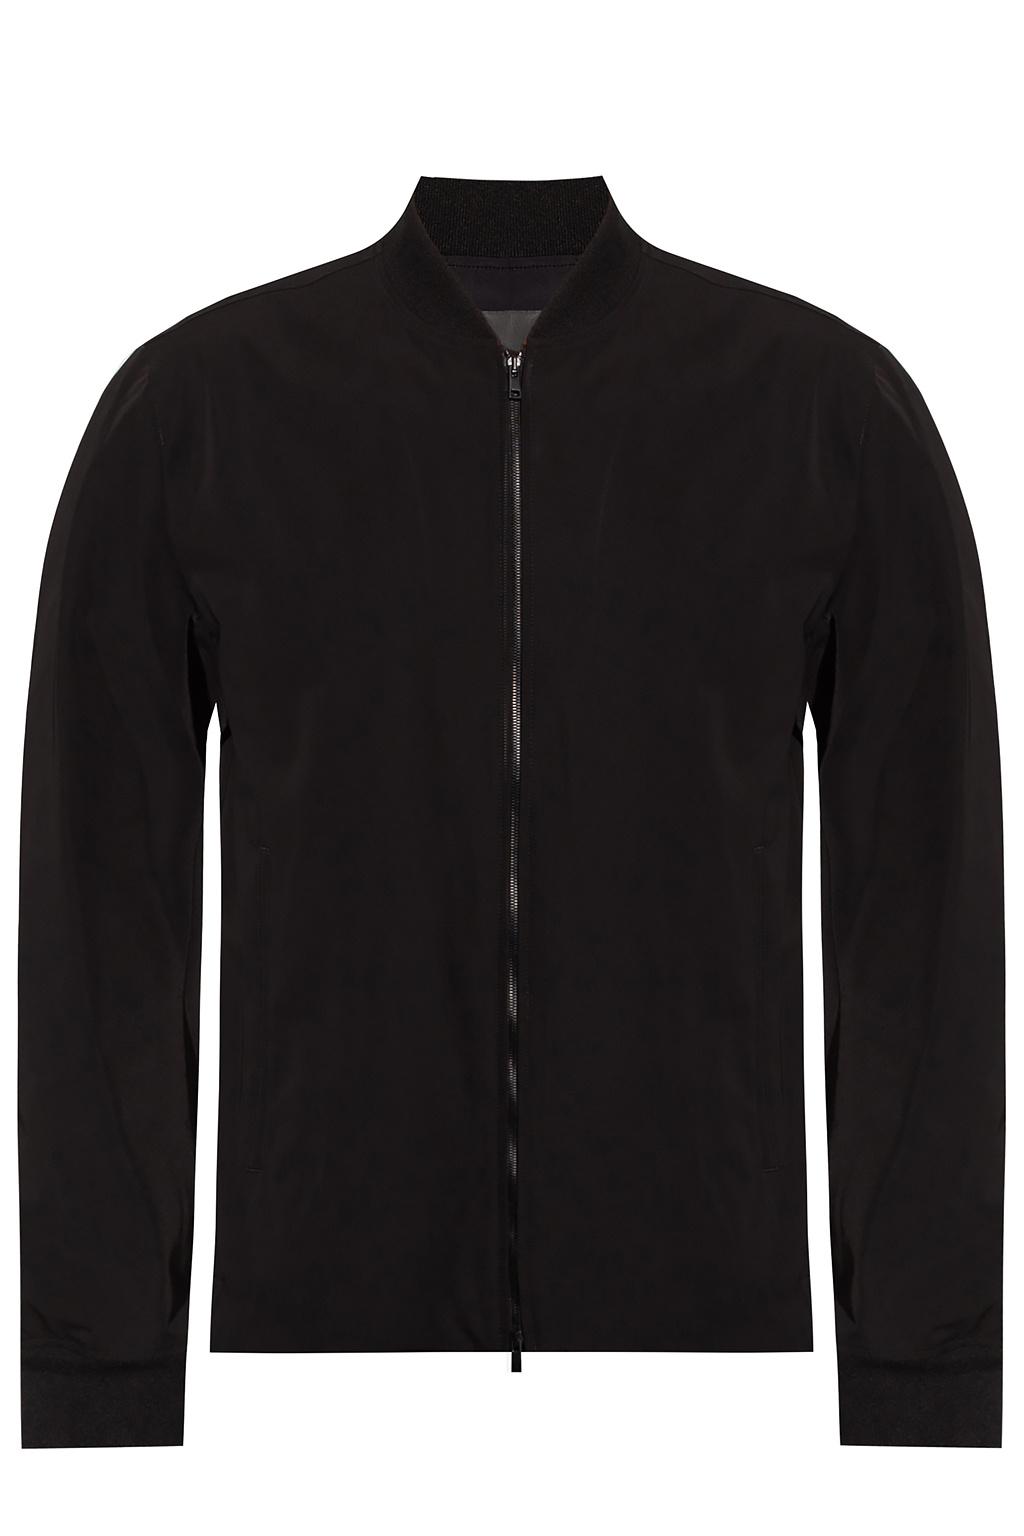 Theory Zip-up jacket